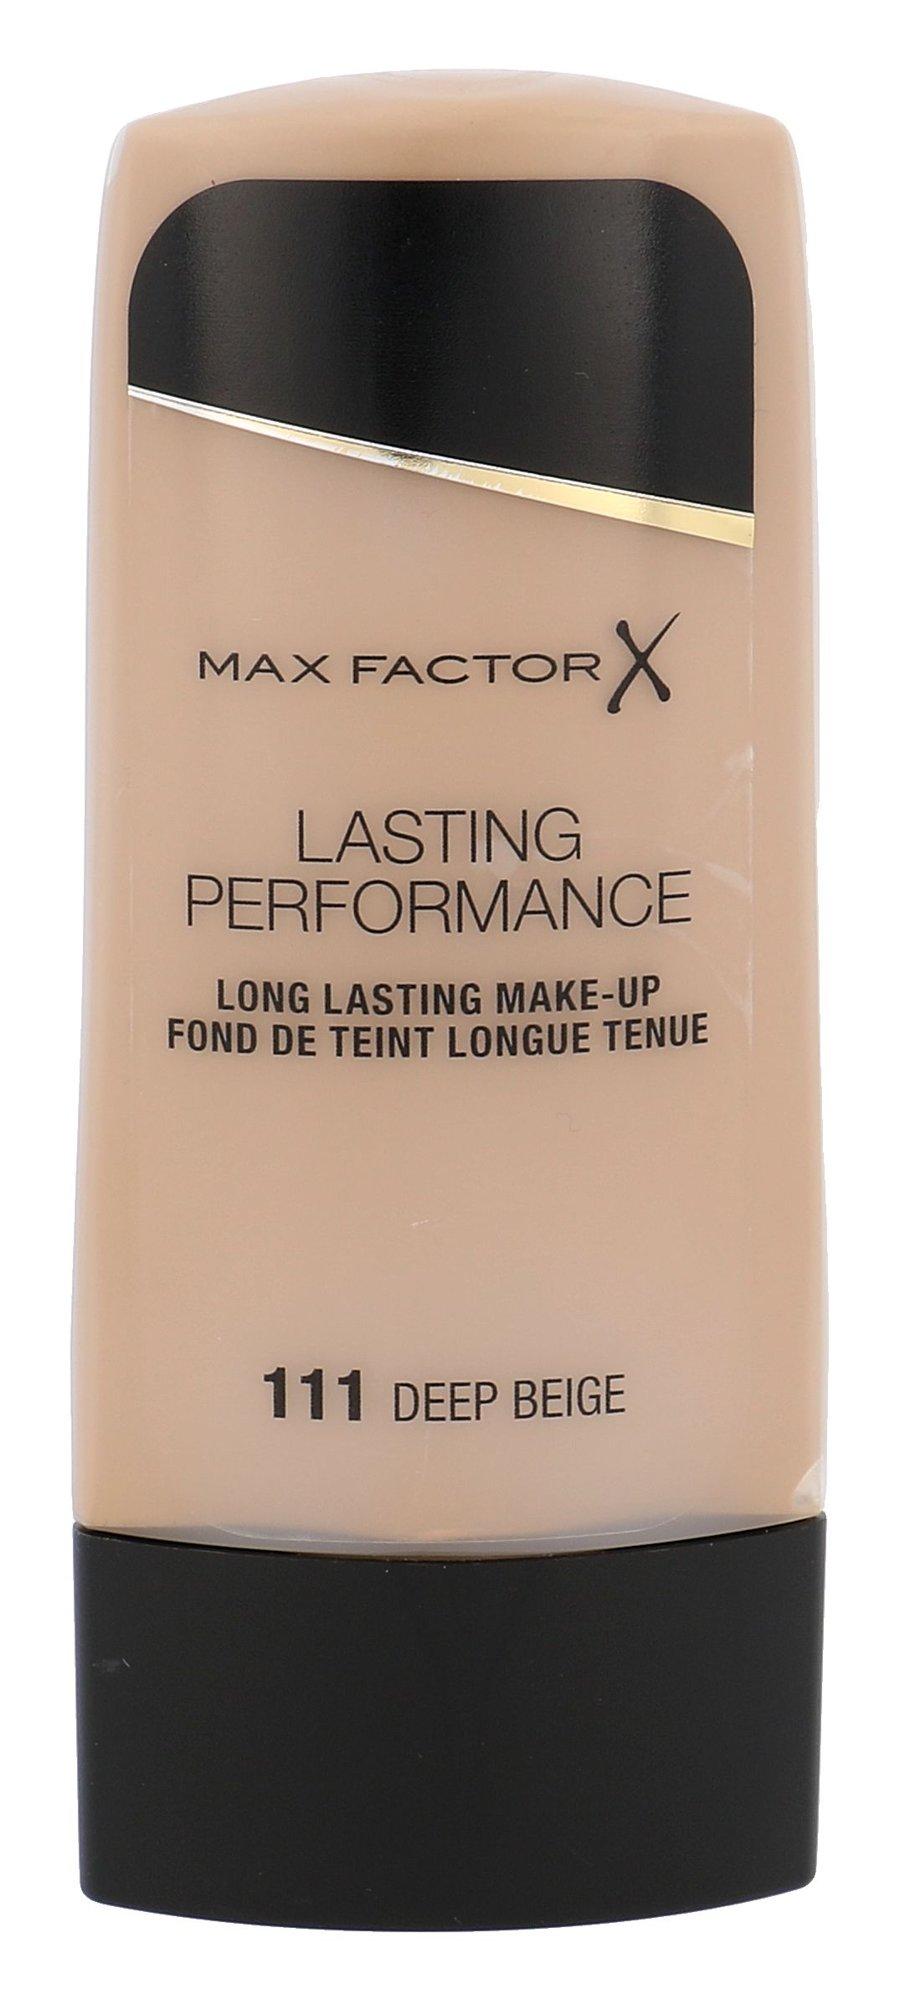 Max Factor Lasting Performance Cosmetic 35ml 111 Deep Beige